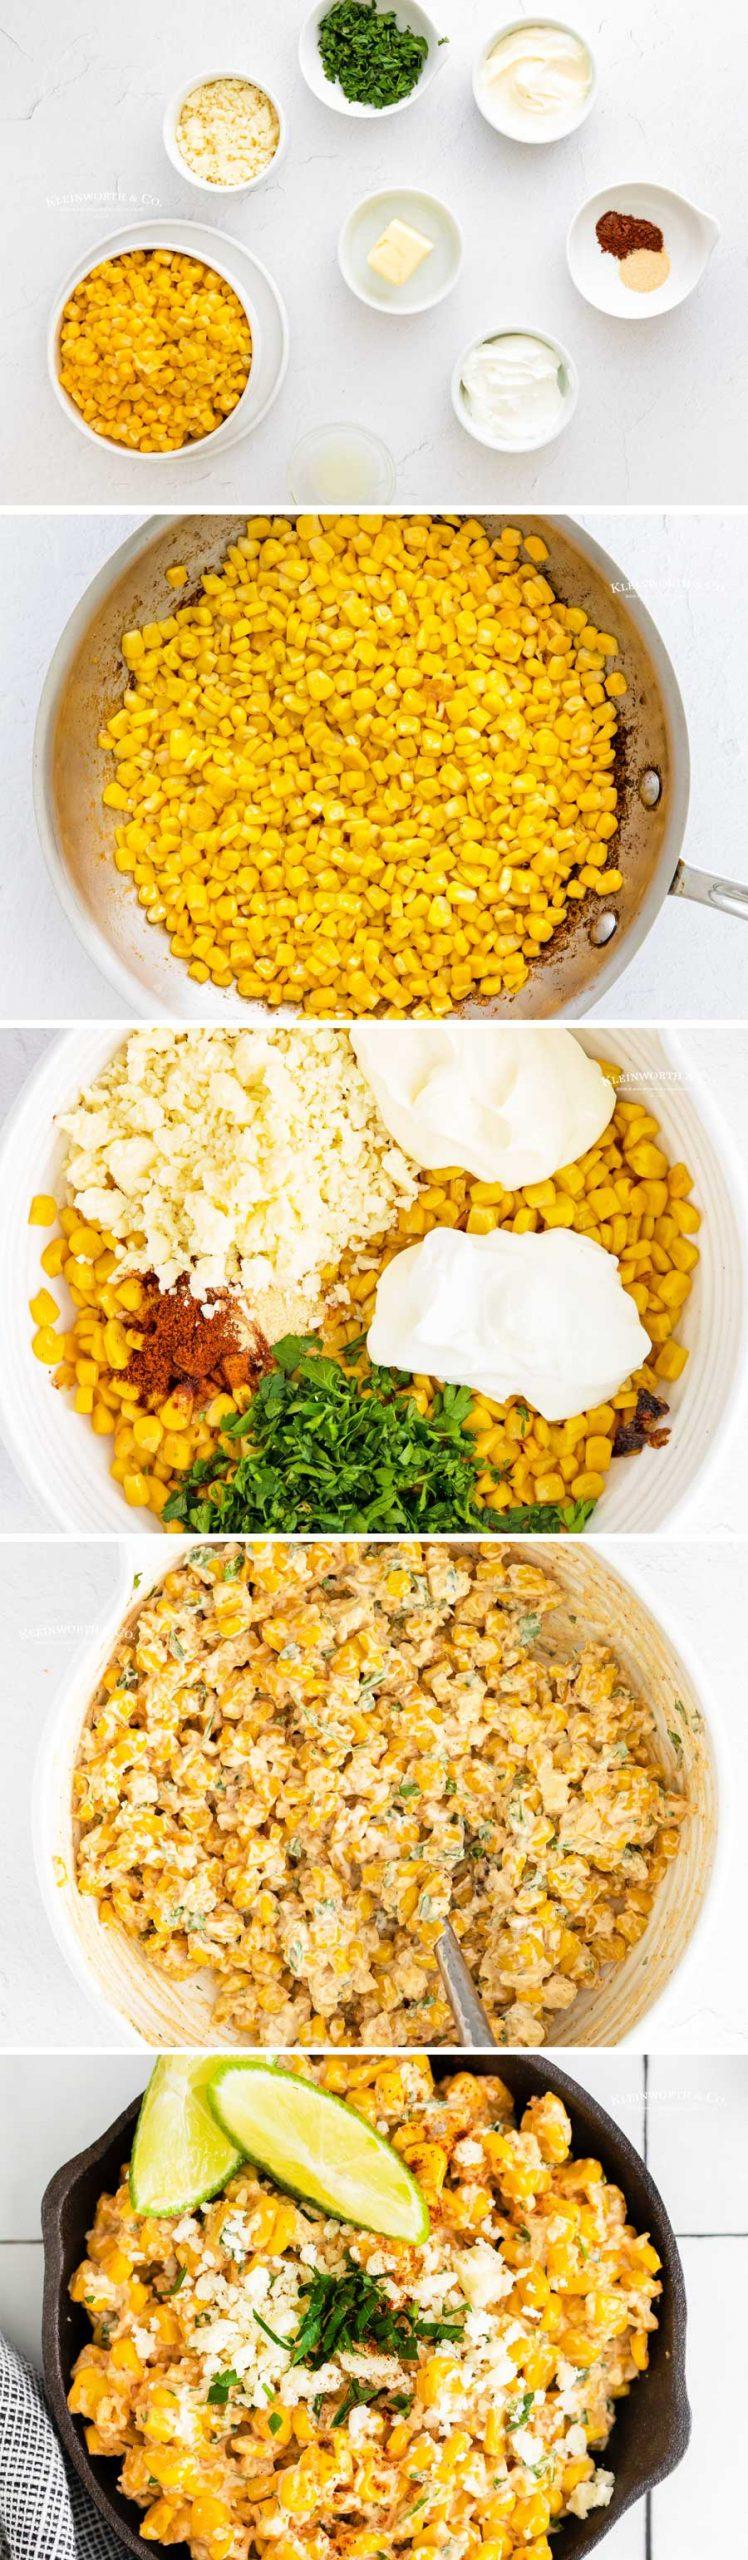 how to make Elote Street Corn Dip